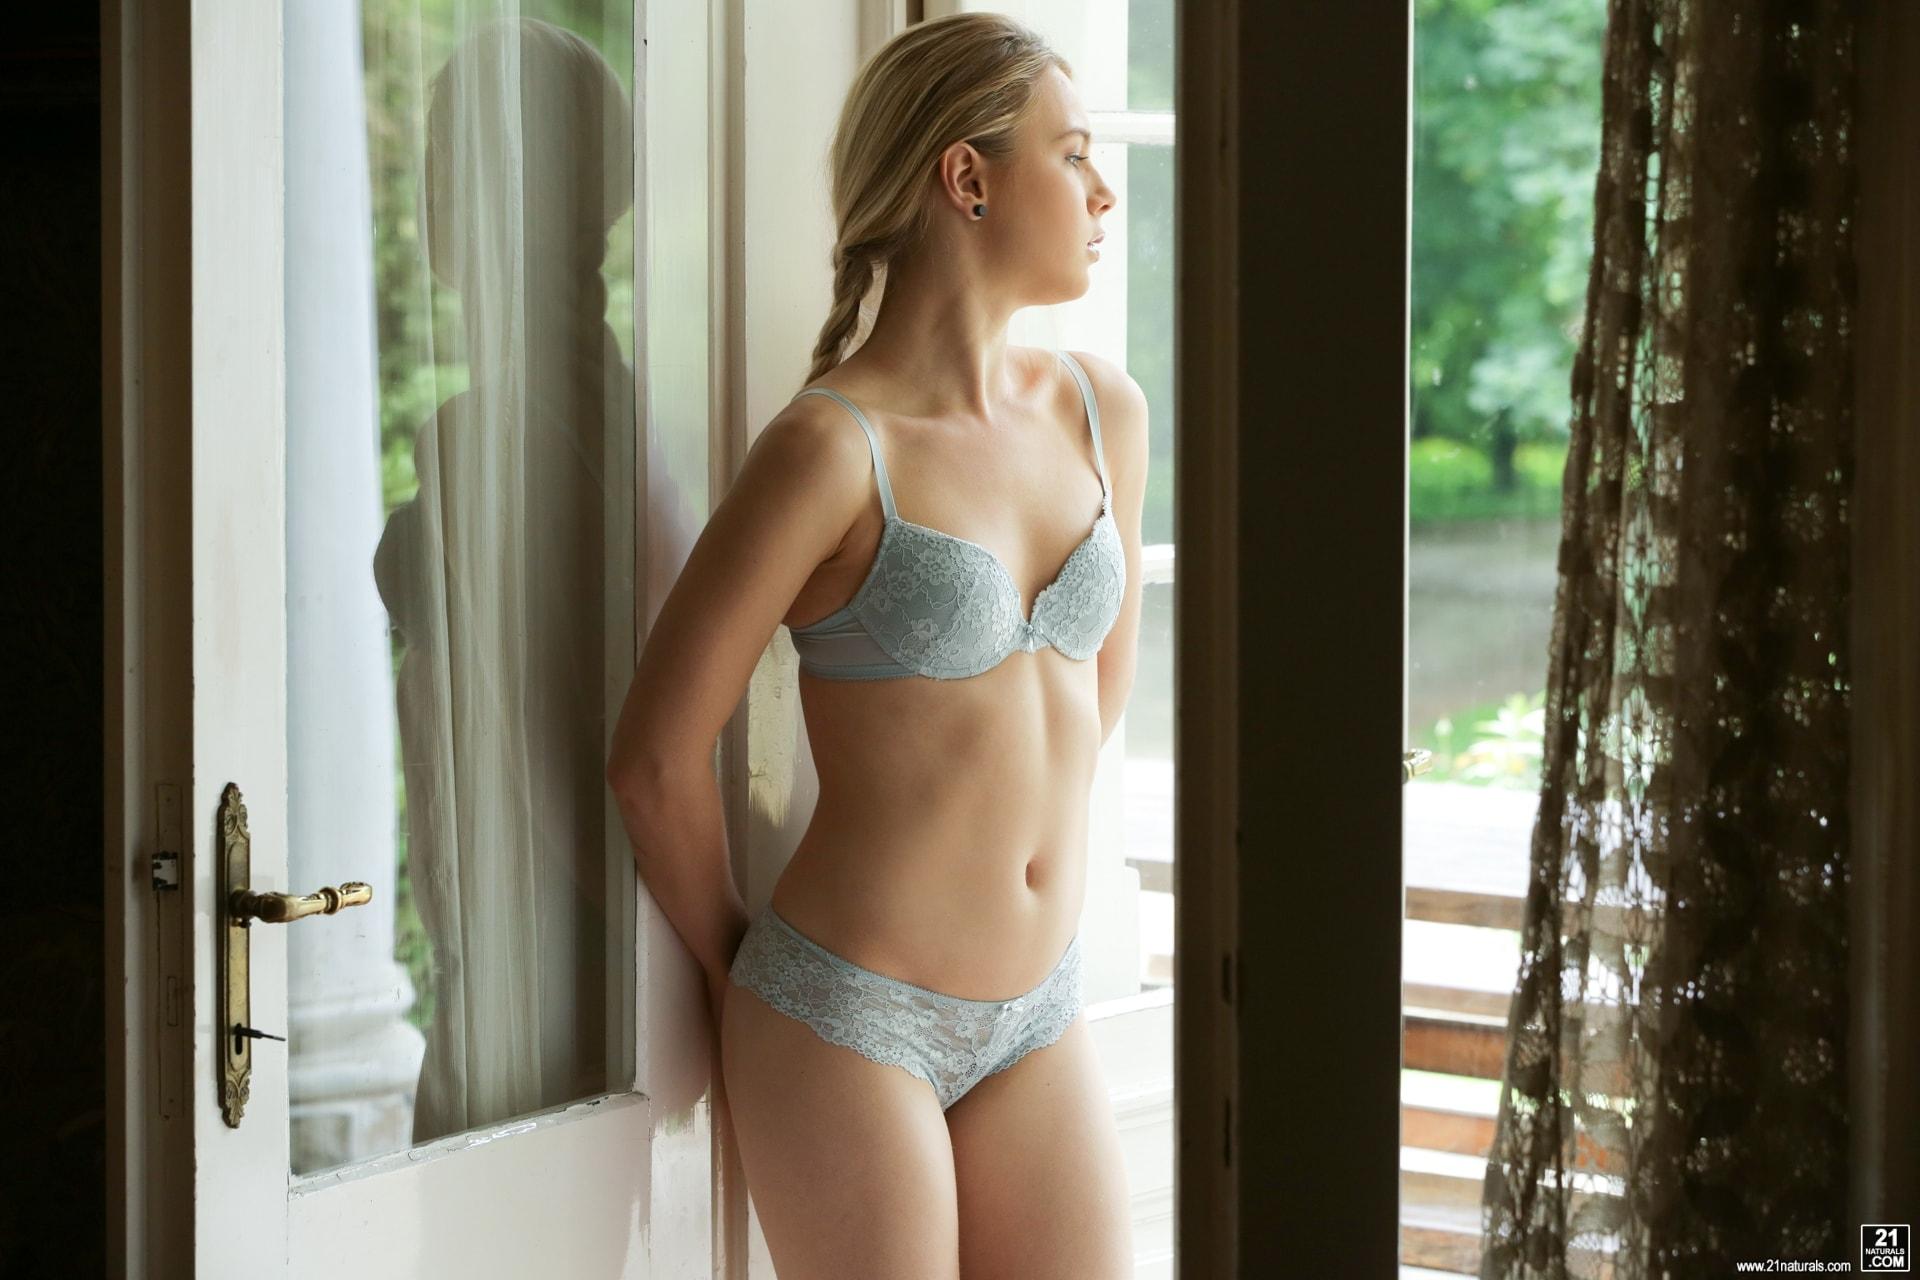 21Sextury 'Intimate Passion' starring Alecia Fox (Photo 1)